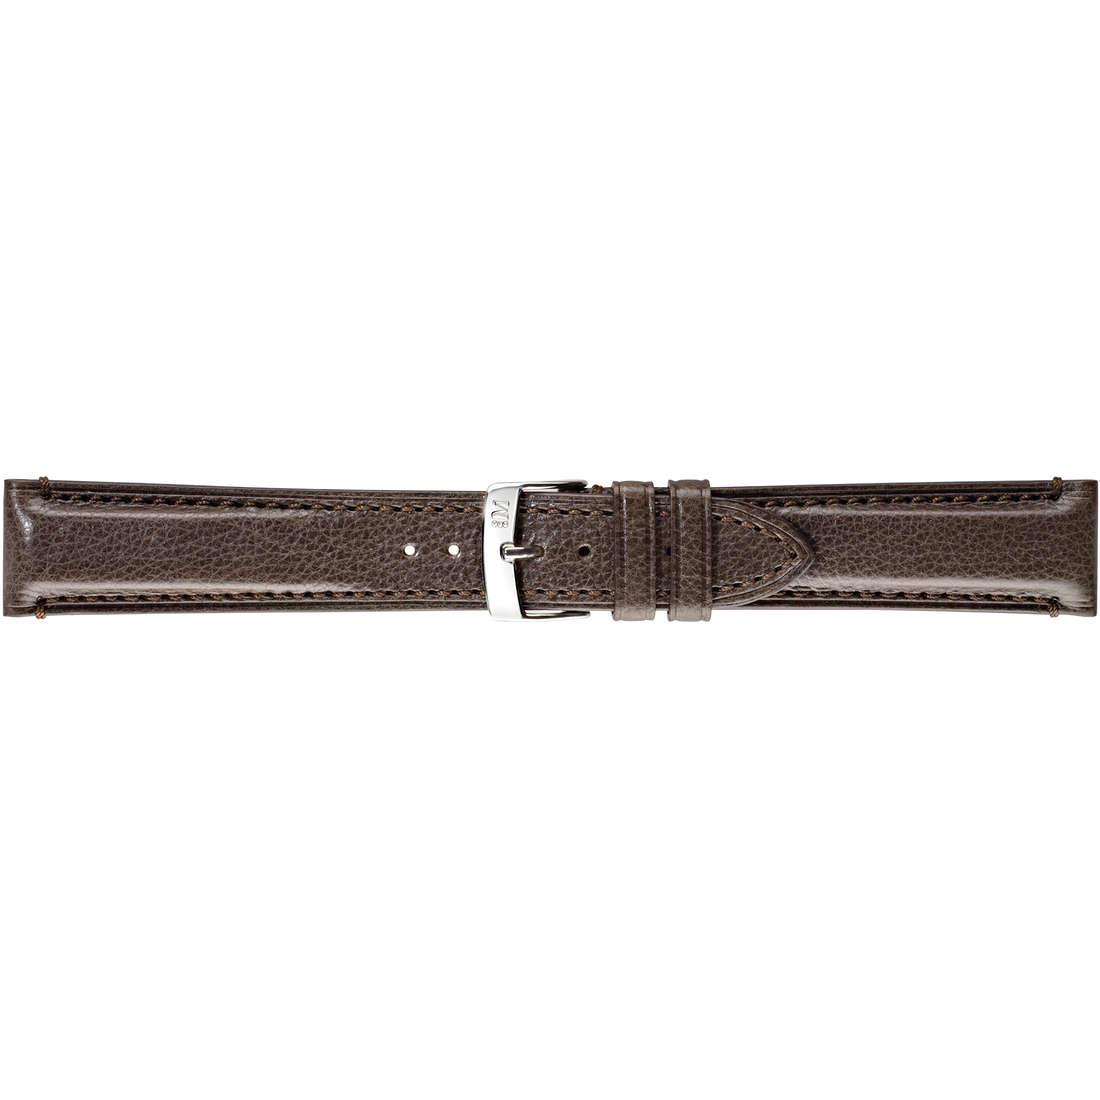 watch watch bands watch straps man Morellato Manufatti A01X4684B73032CR22